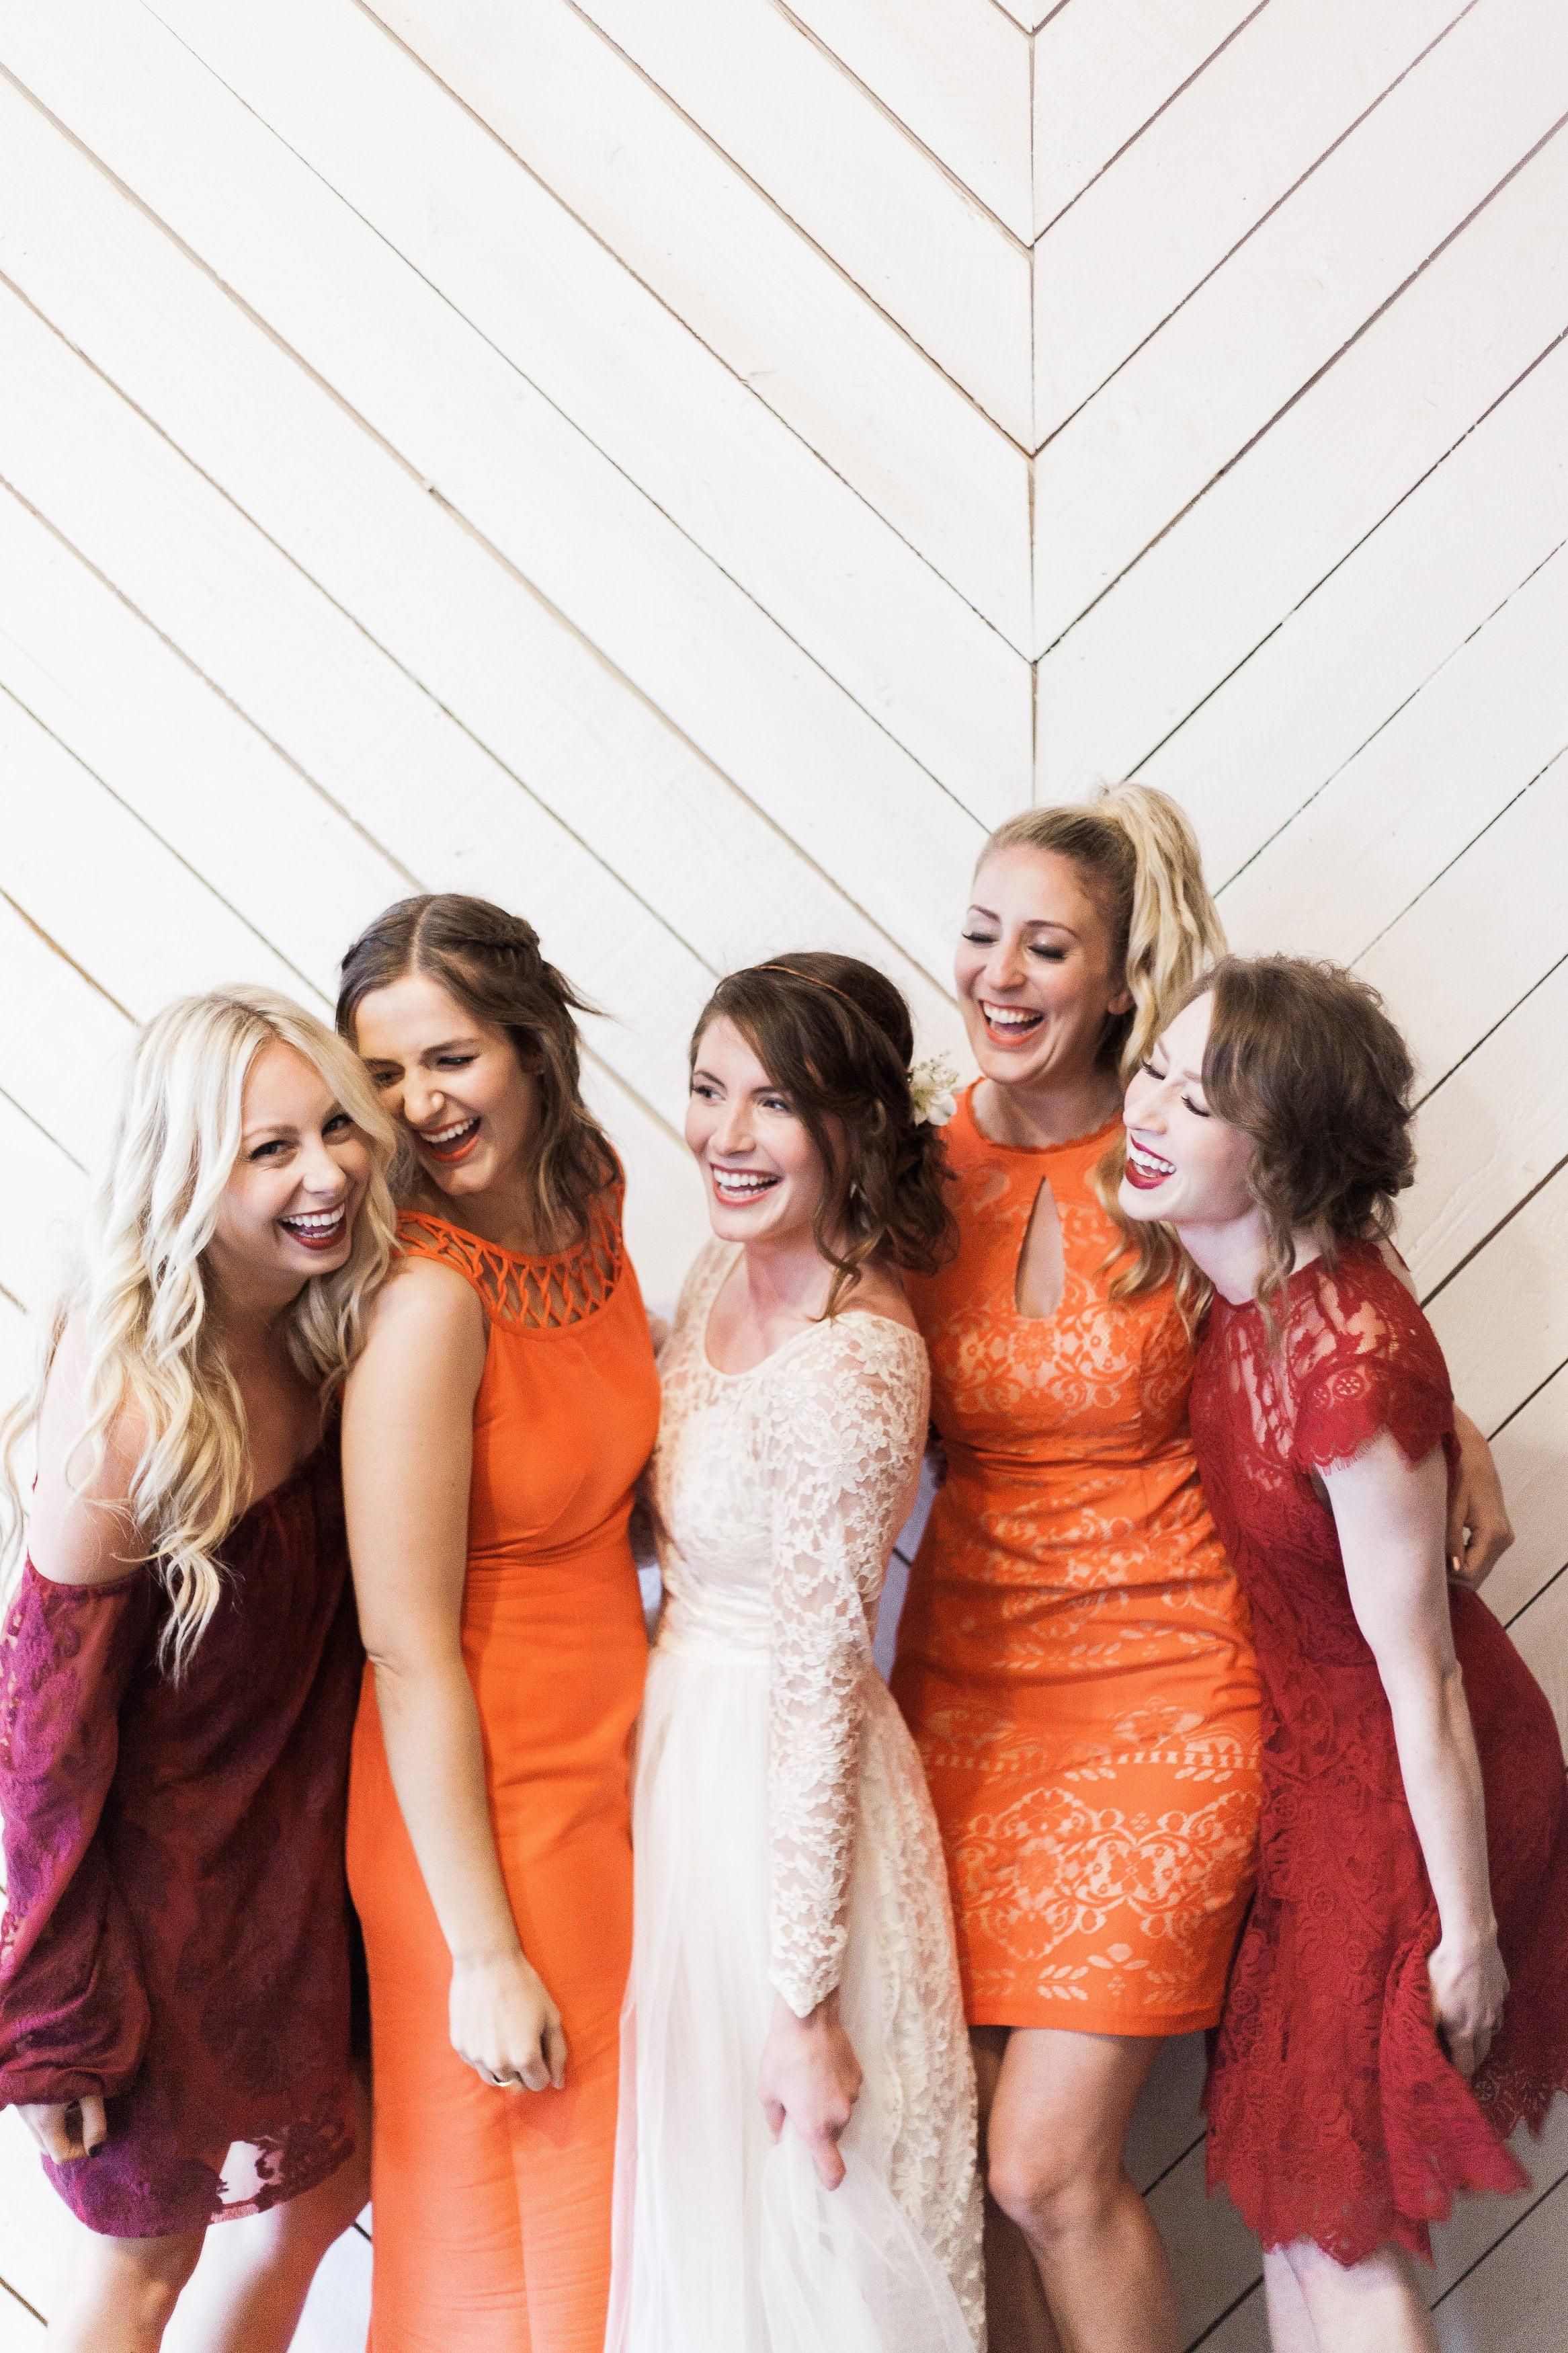 Perfect bridesmaids colors!